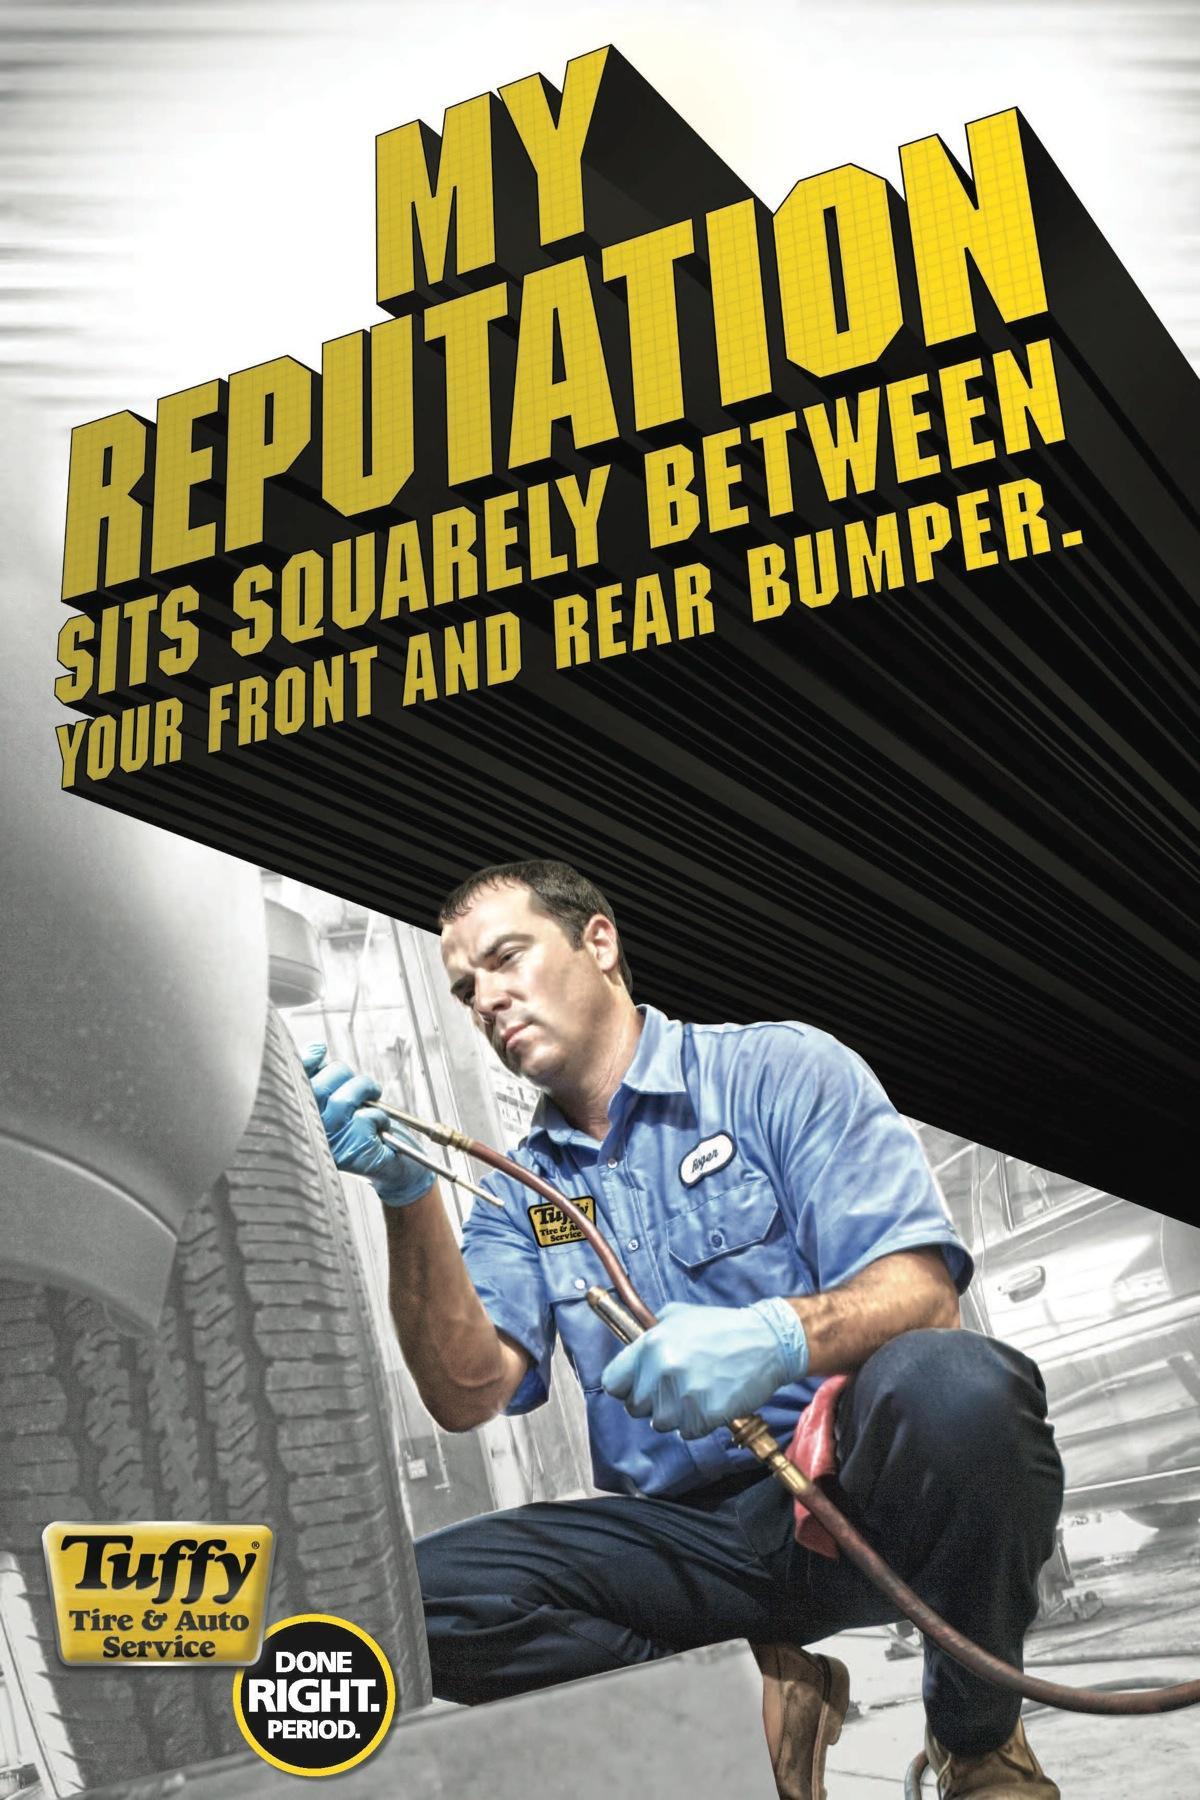 Tuffy Tire & Auto Service Print Ad -  Reputation